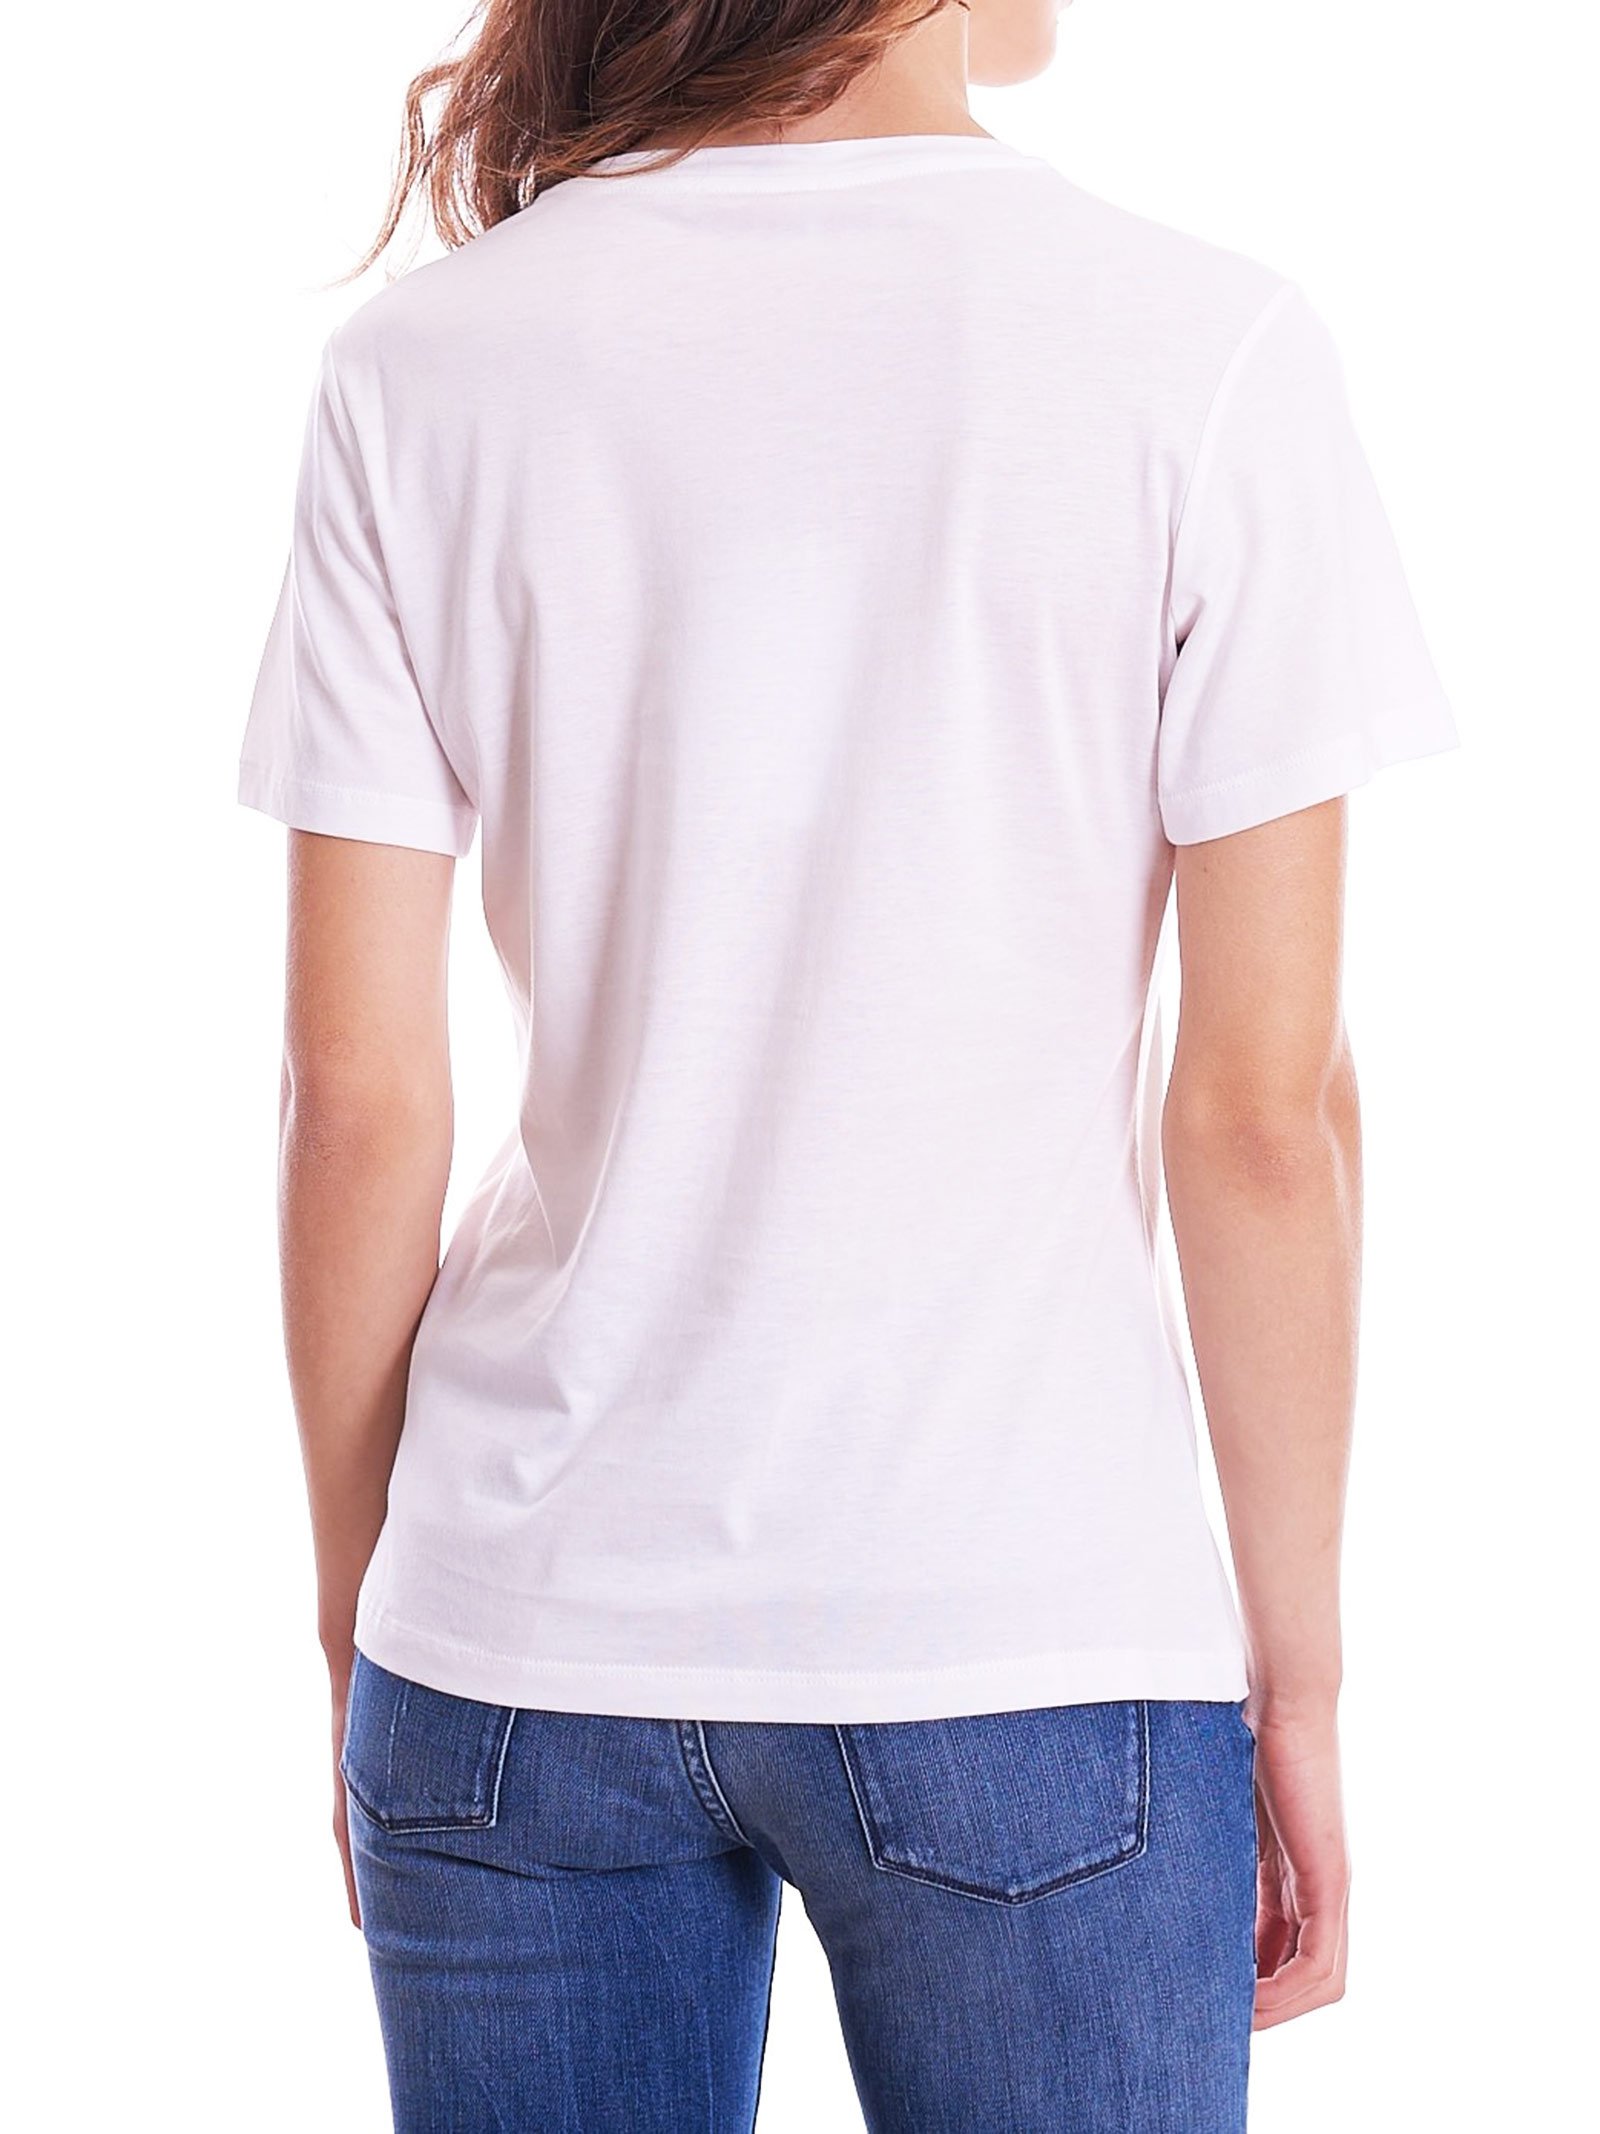 t-shirt fashion glasses LUCKYLU | T-shirt | TS07JJ0001